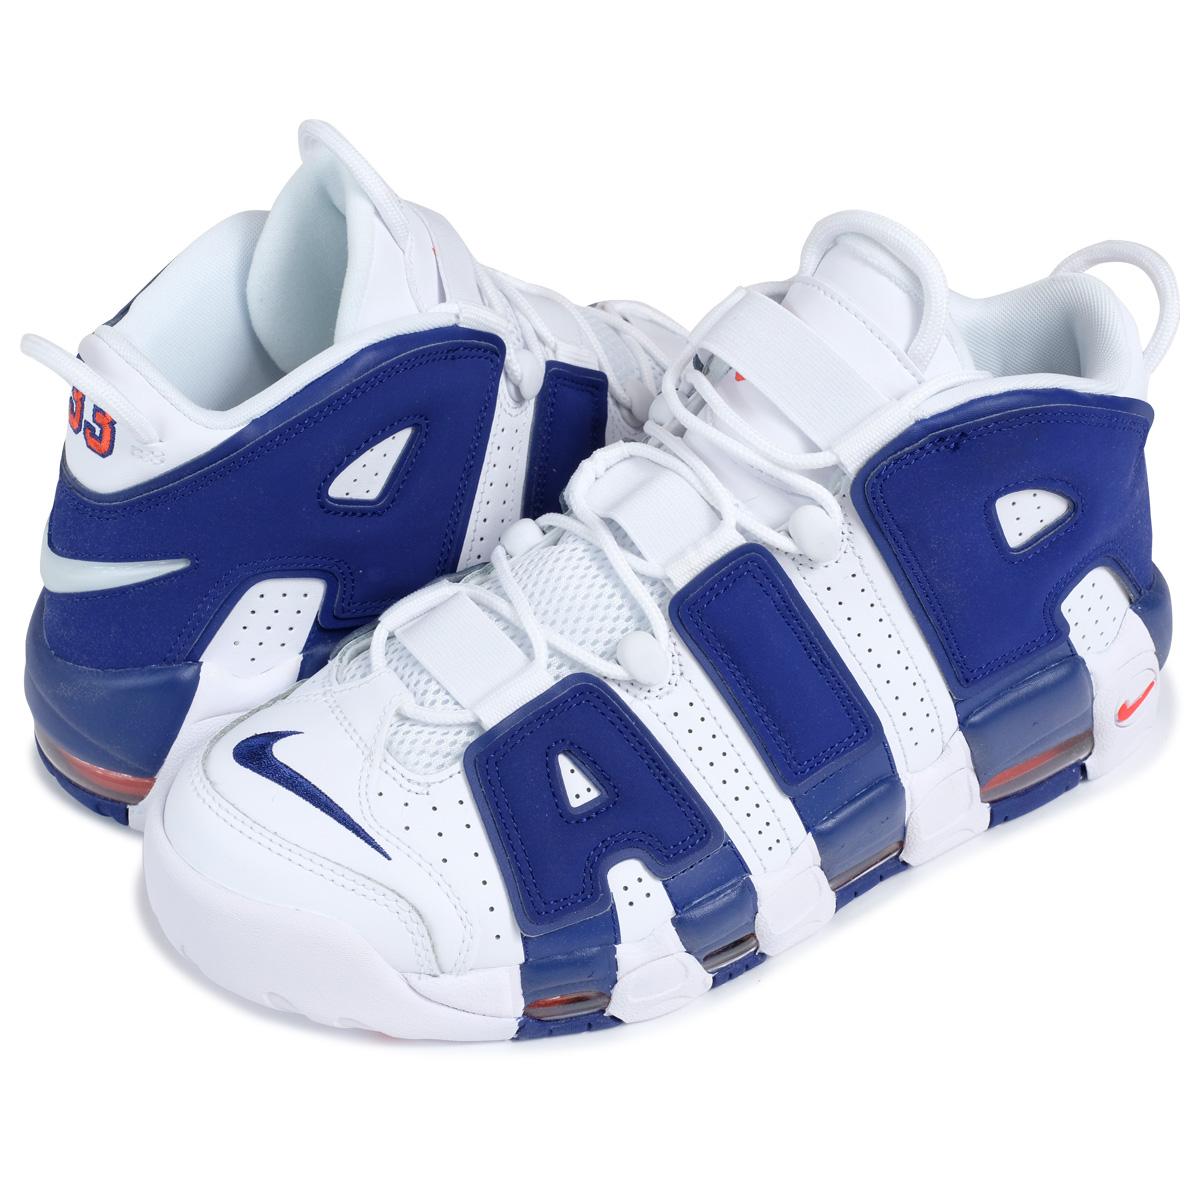 417db79035 ALLSPORTS: NIKE AIR MORE UPTEMPO Nike air more up tempo 96 sneakers  921,948-101 men's shoes white [11/16 Shinnyu load] [1711] | Rakuten Global  Market